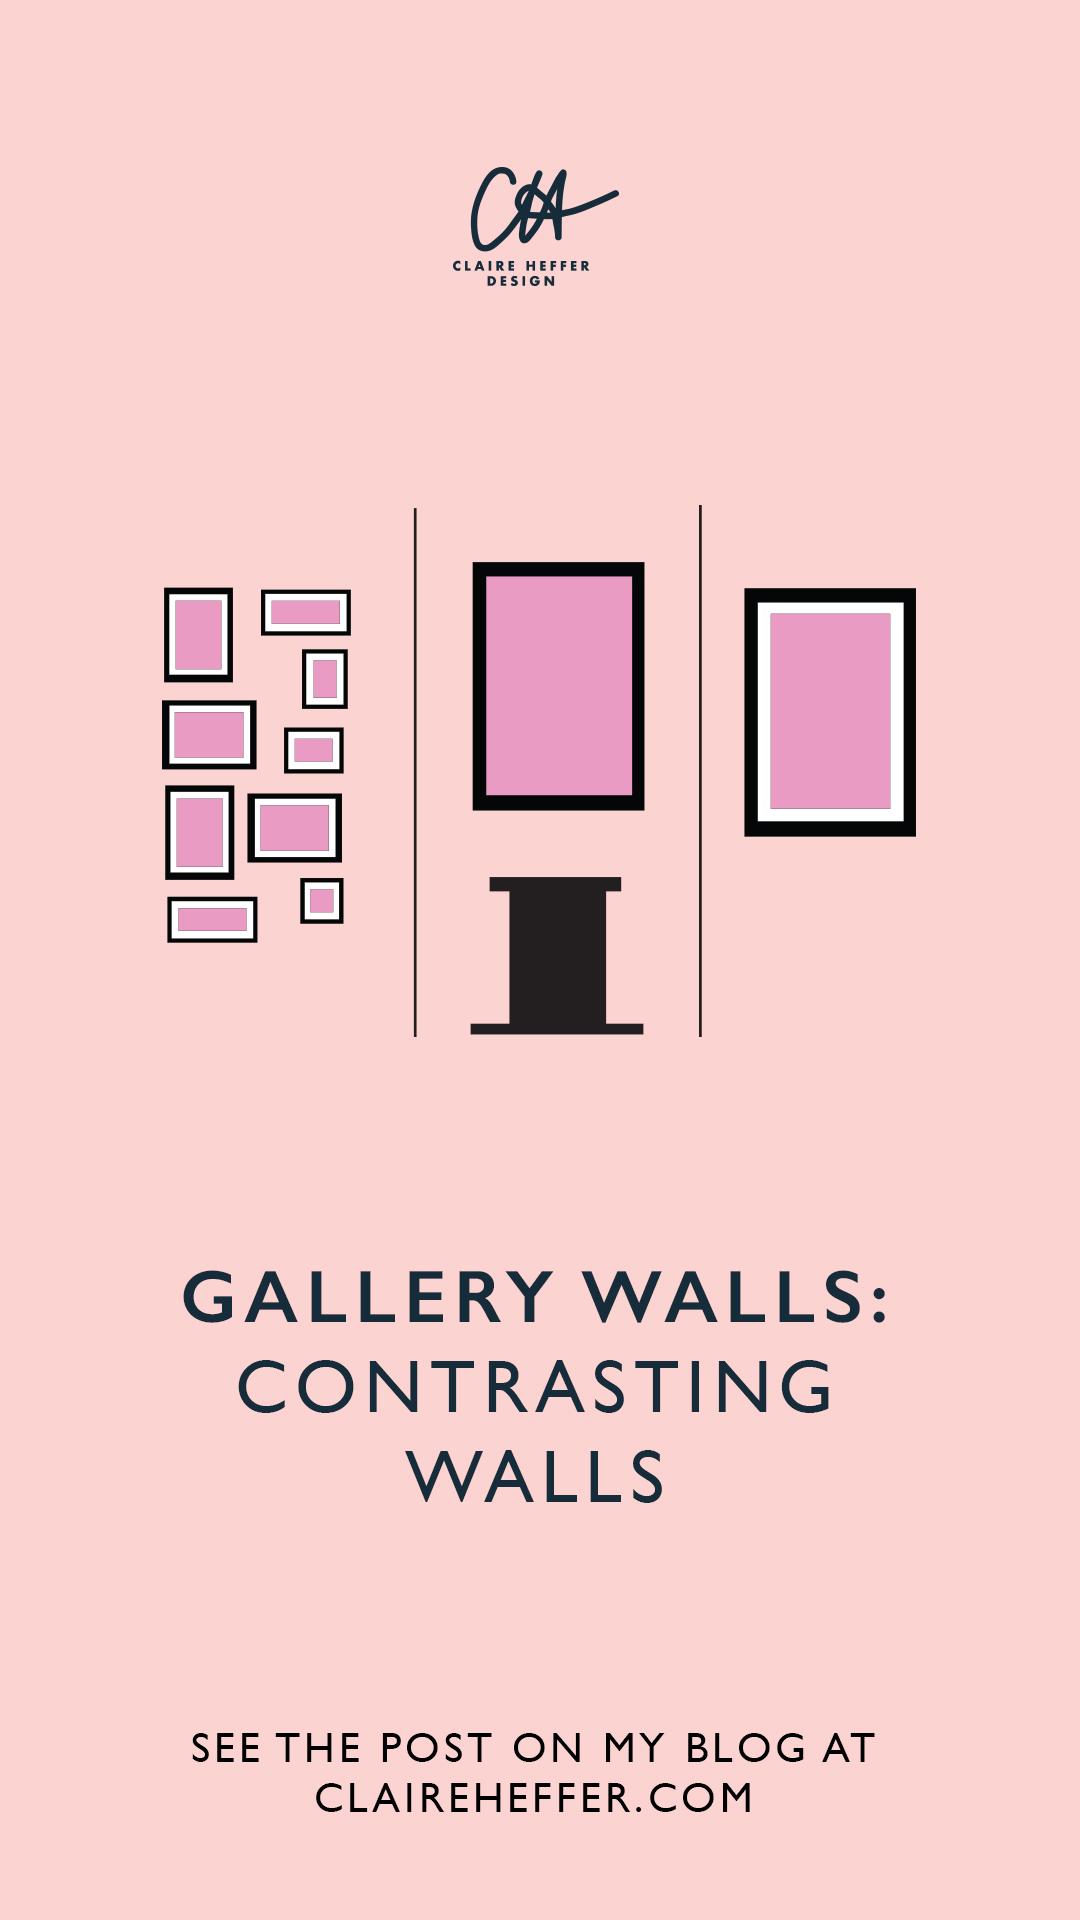 GALLERY WALLS CONTRASTING WALLS.jpg